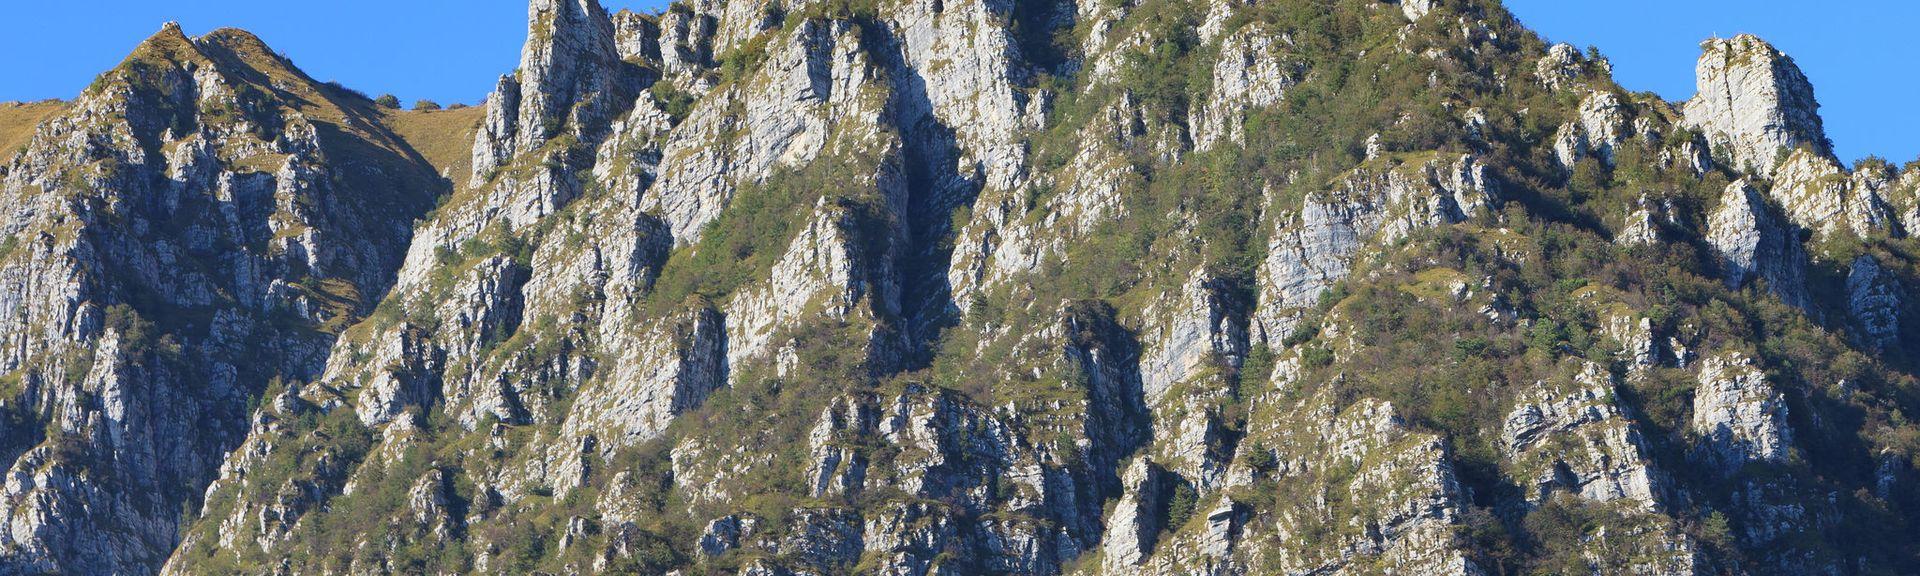 Castelnovo del Friuli, Frioul-Vénétie julienne, Italie